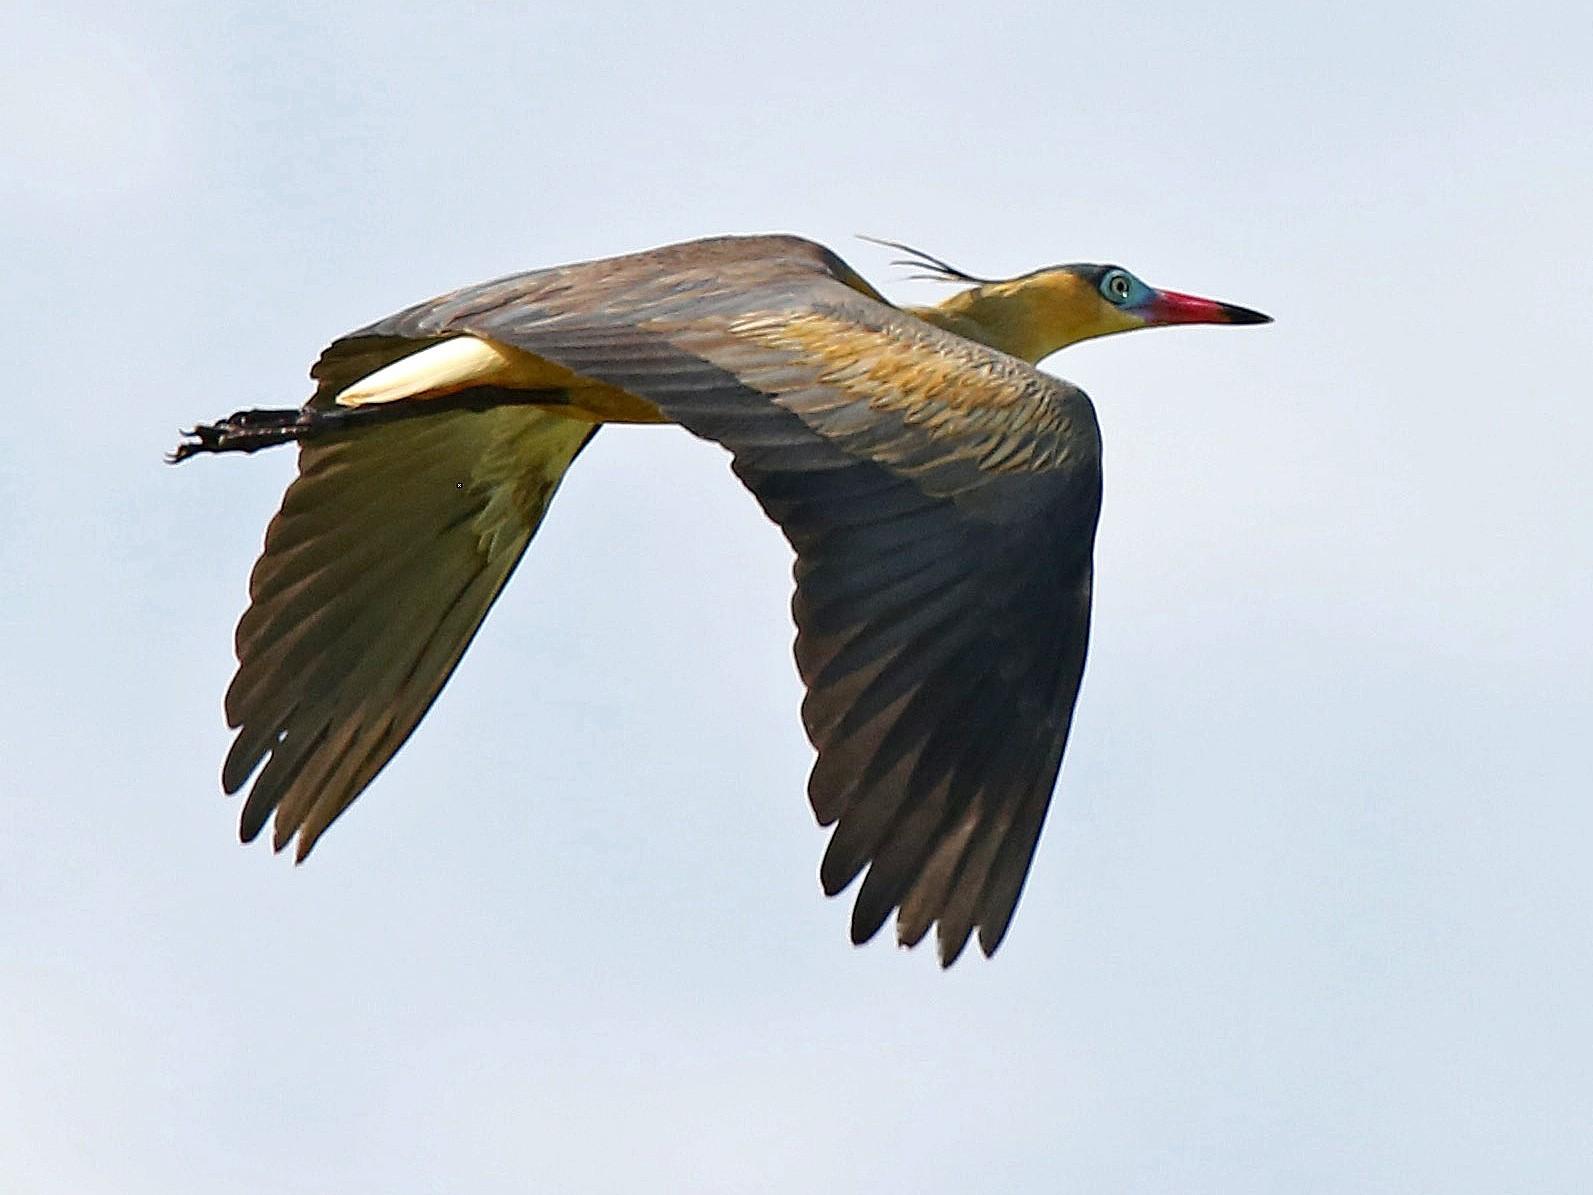 Whistling Heron - Roger Ahlman